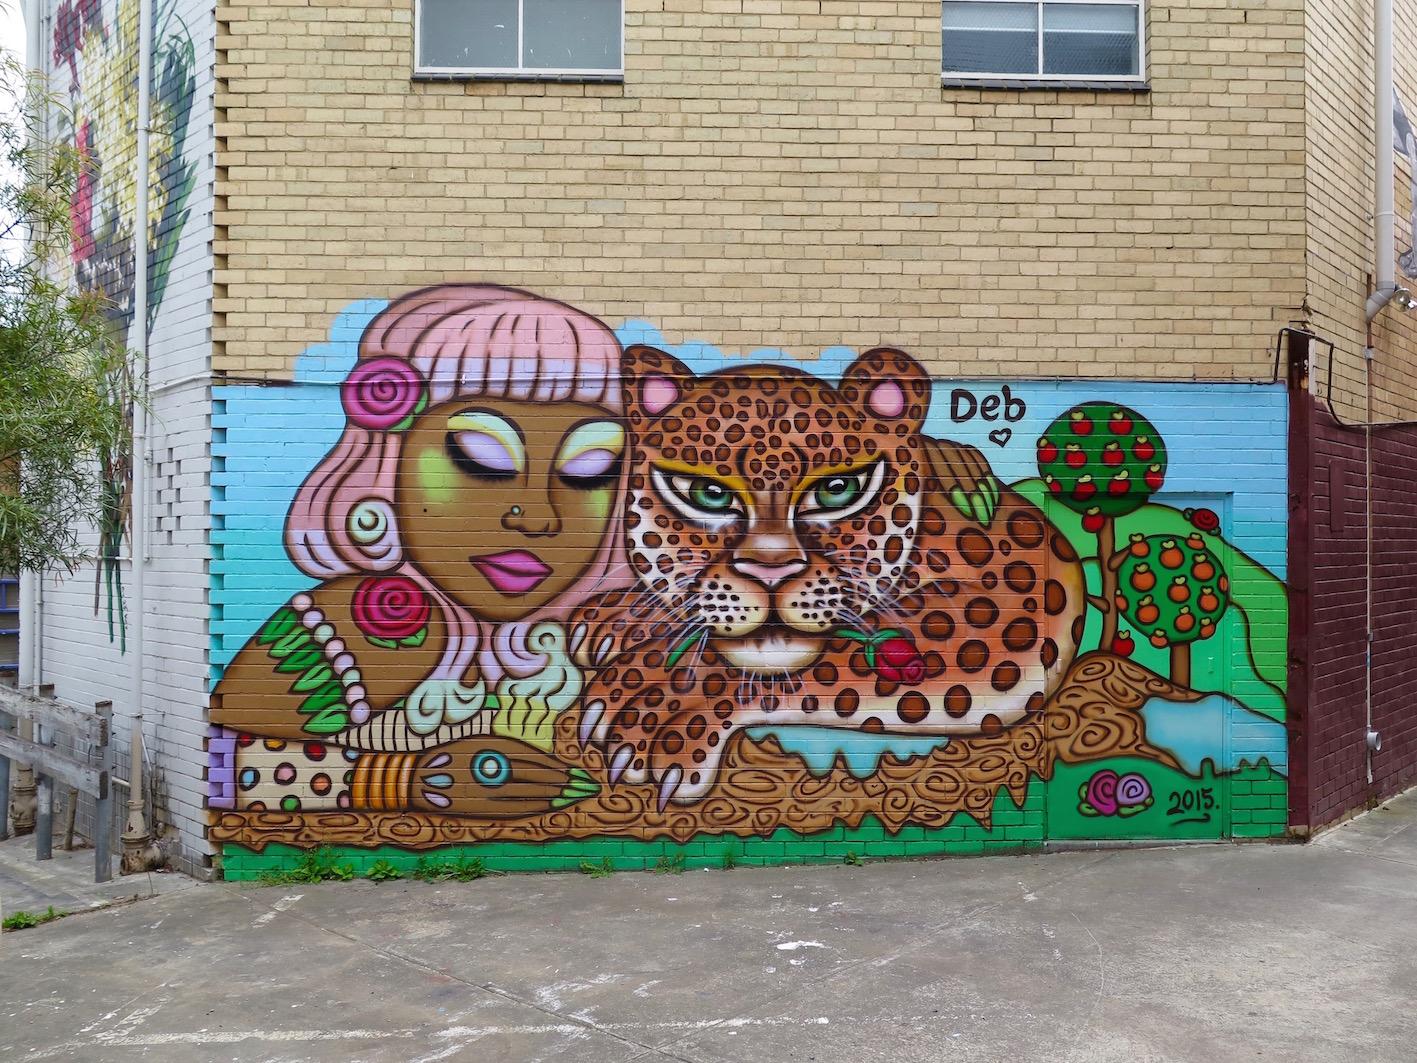 deansunshine_landofsunshine_melbourne_streetart_graffiti_eastland urban art project 14 deb